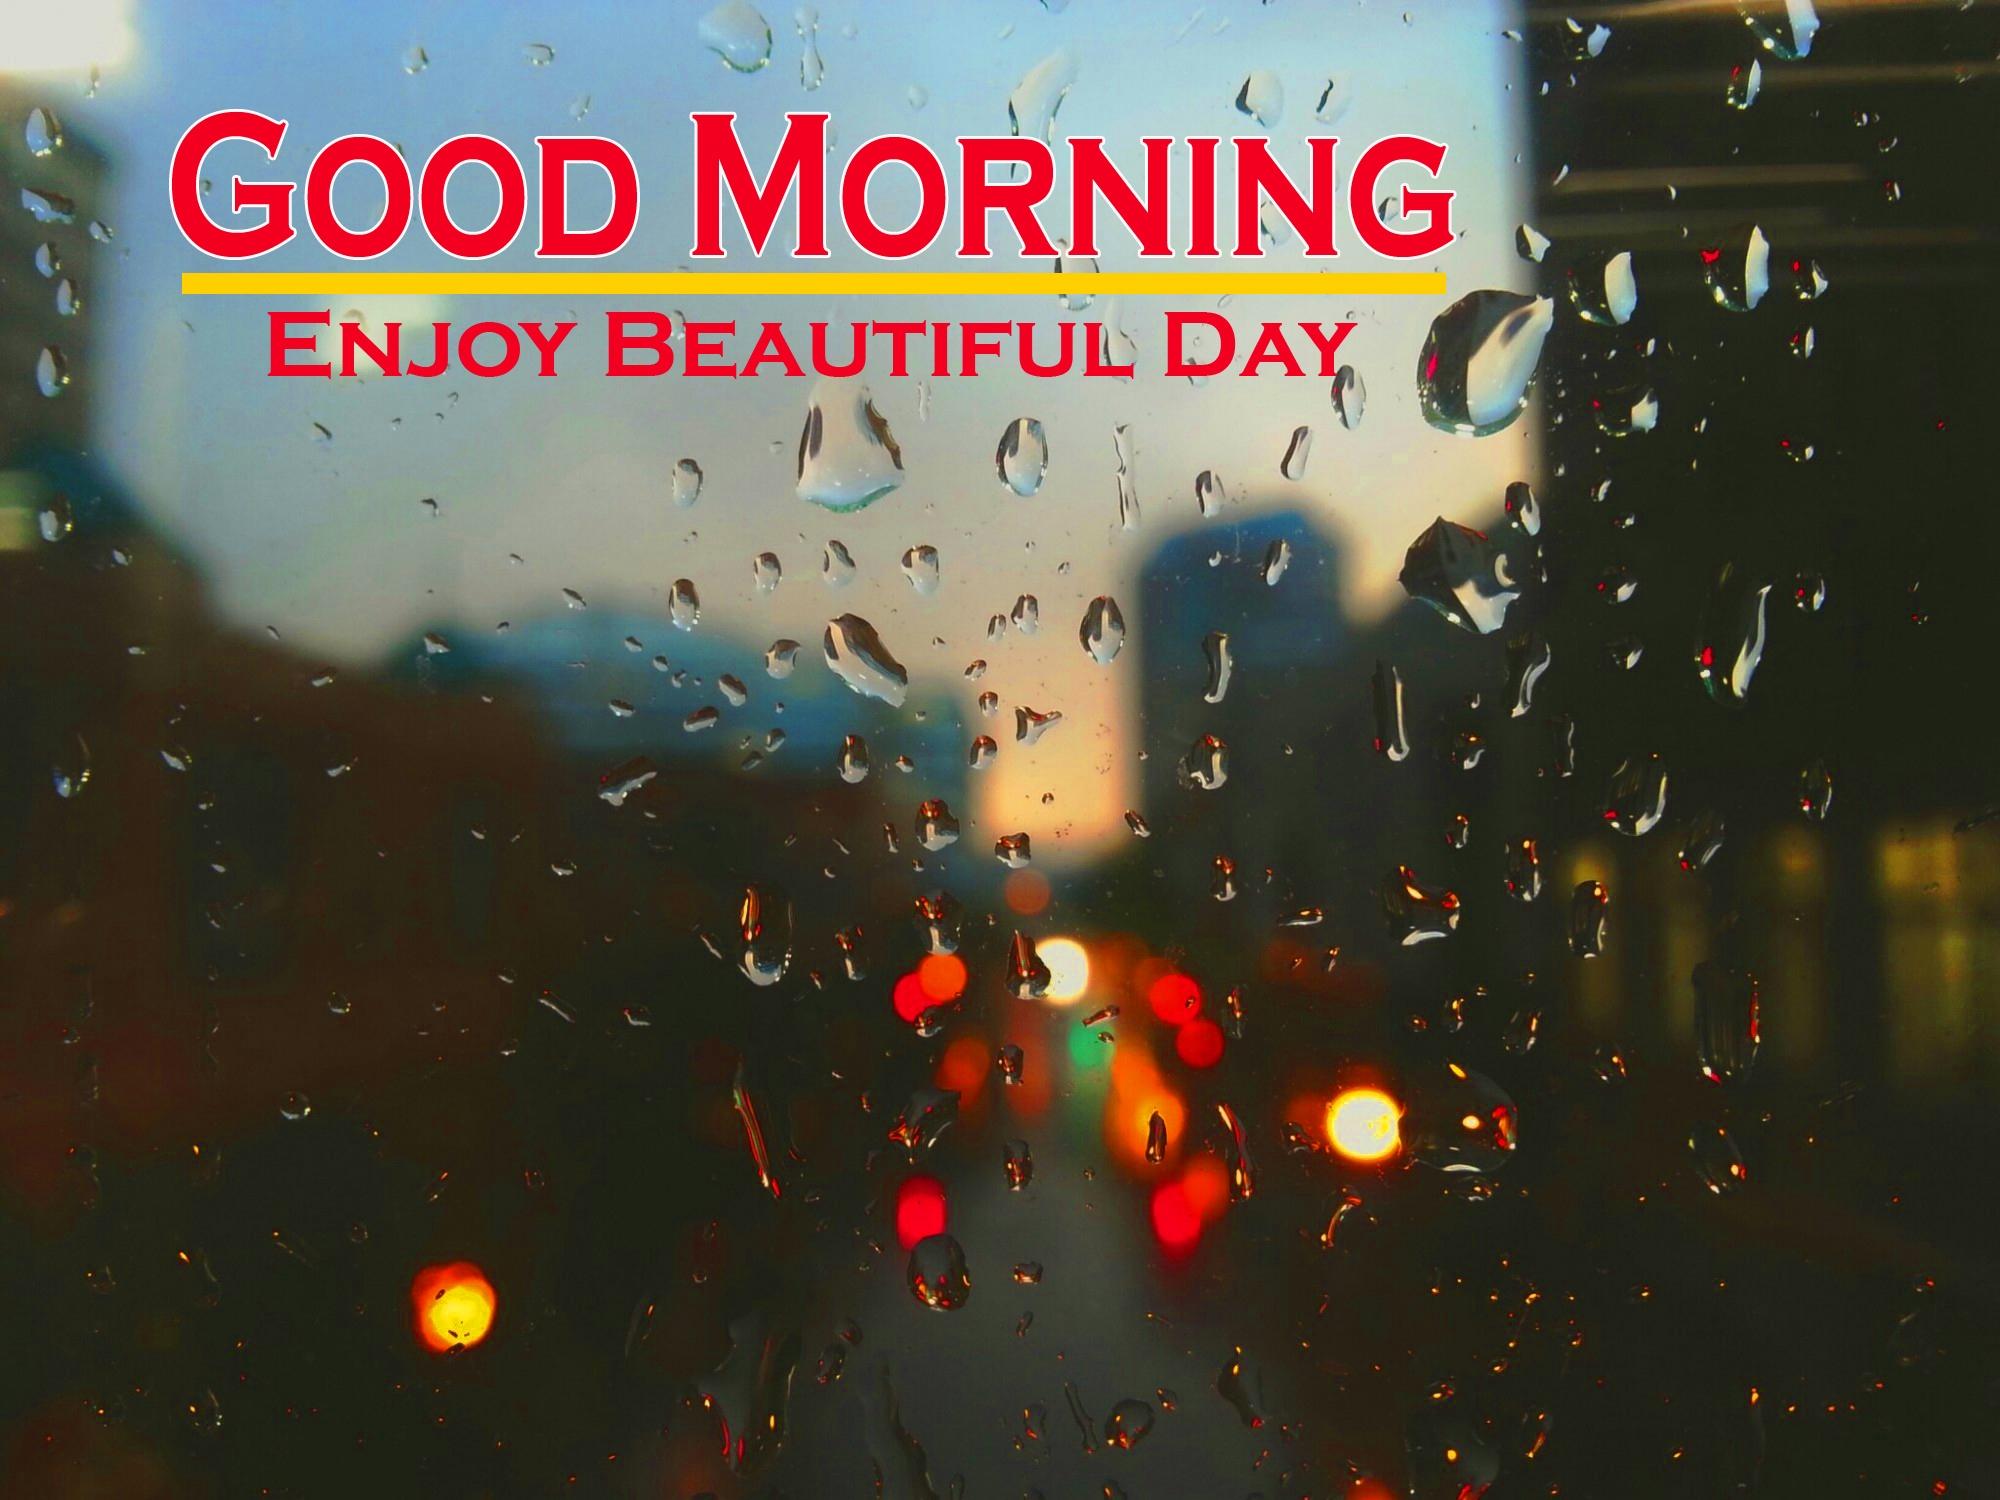 Rainy Day Good Morning Images 6